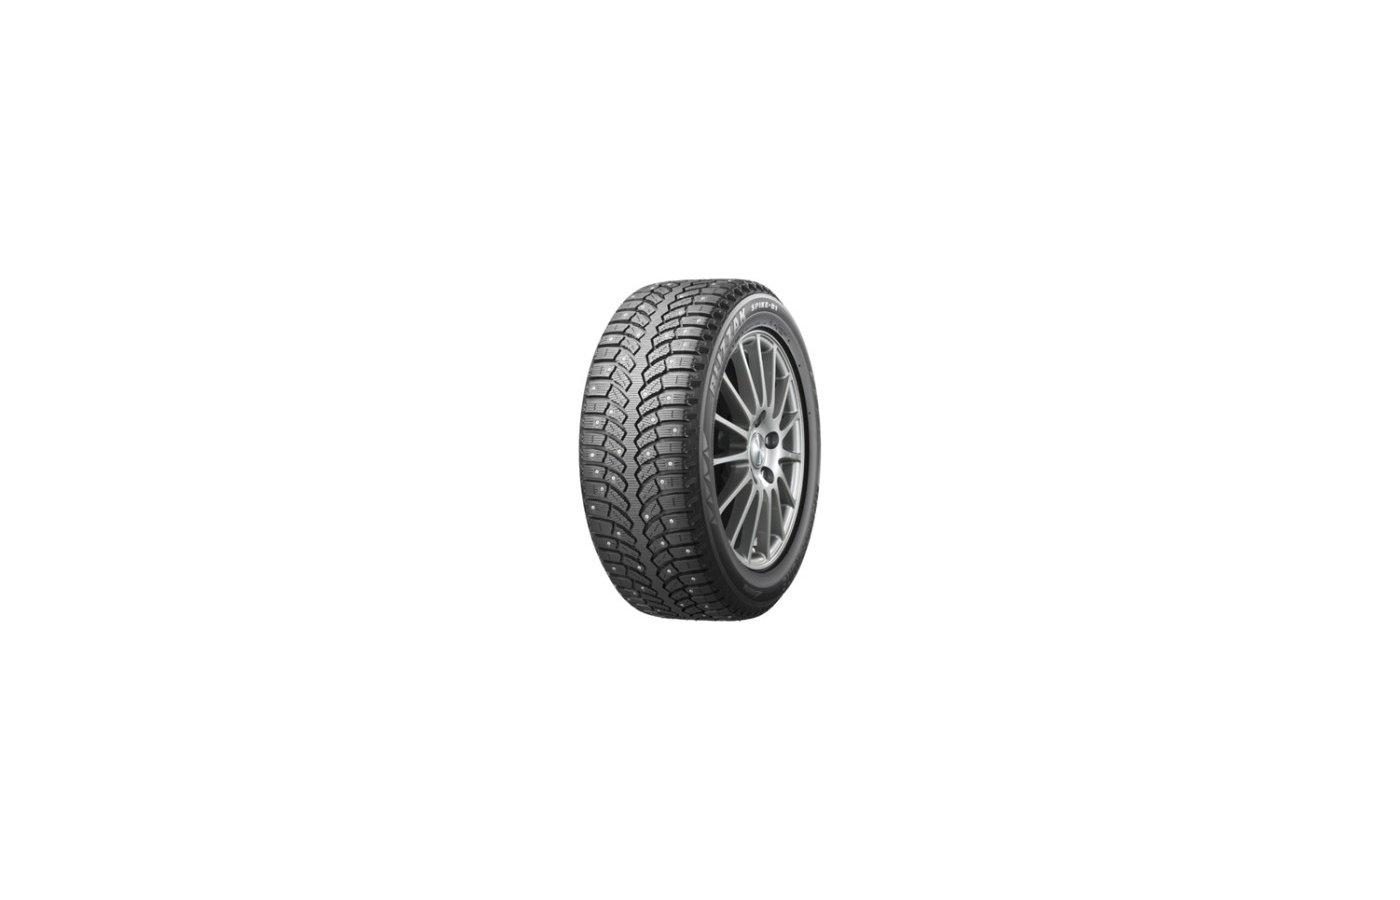 Шина Bridgestone Blizzak Spike-01 205/60 R16 TL 92T шип